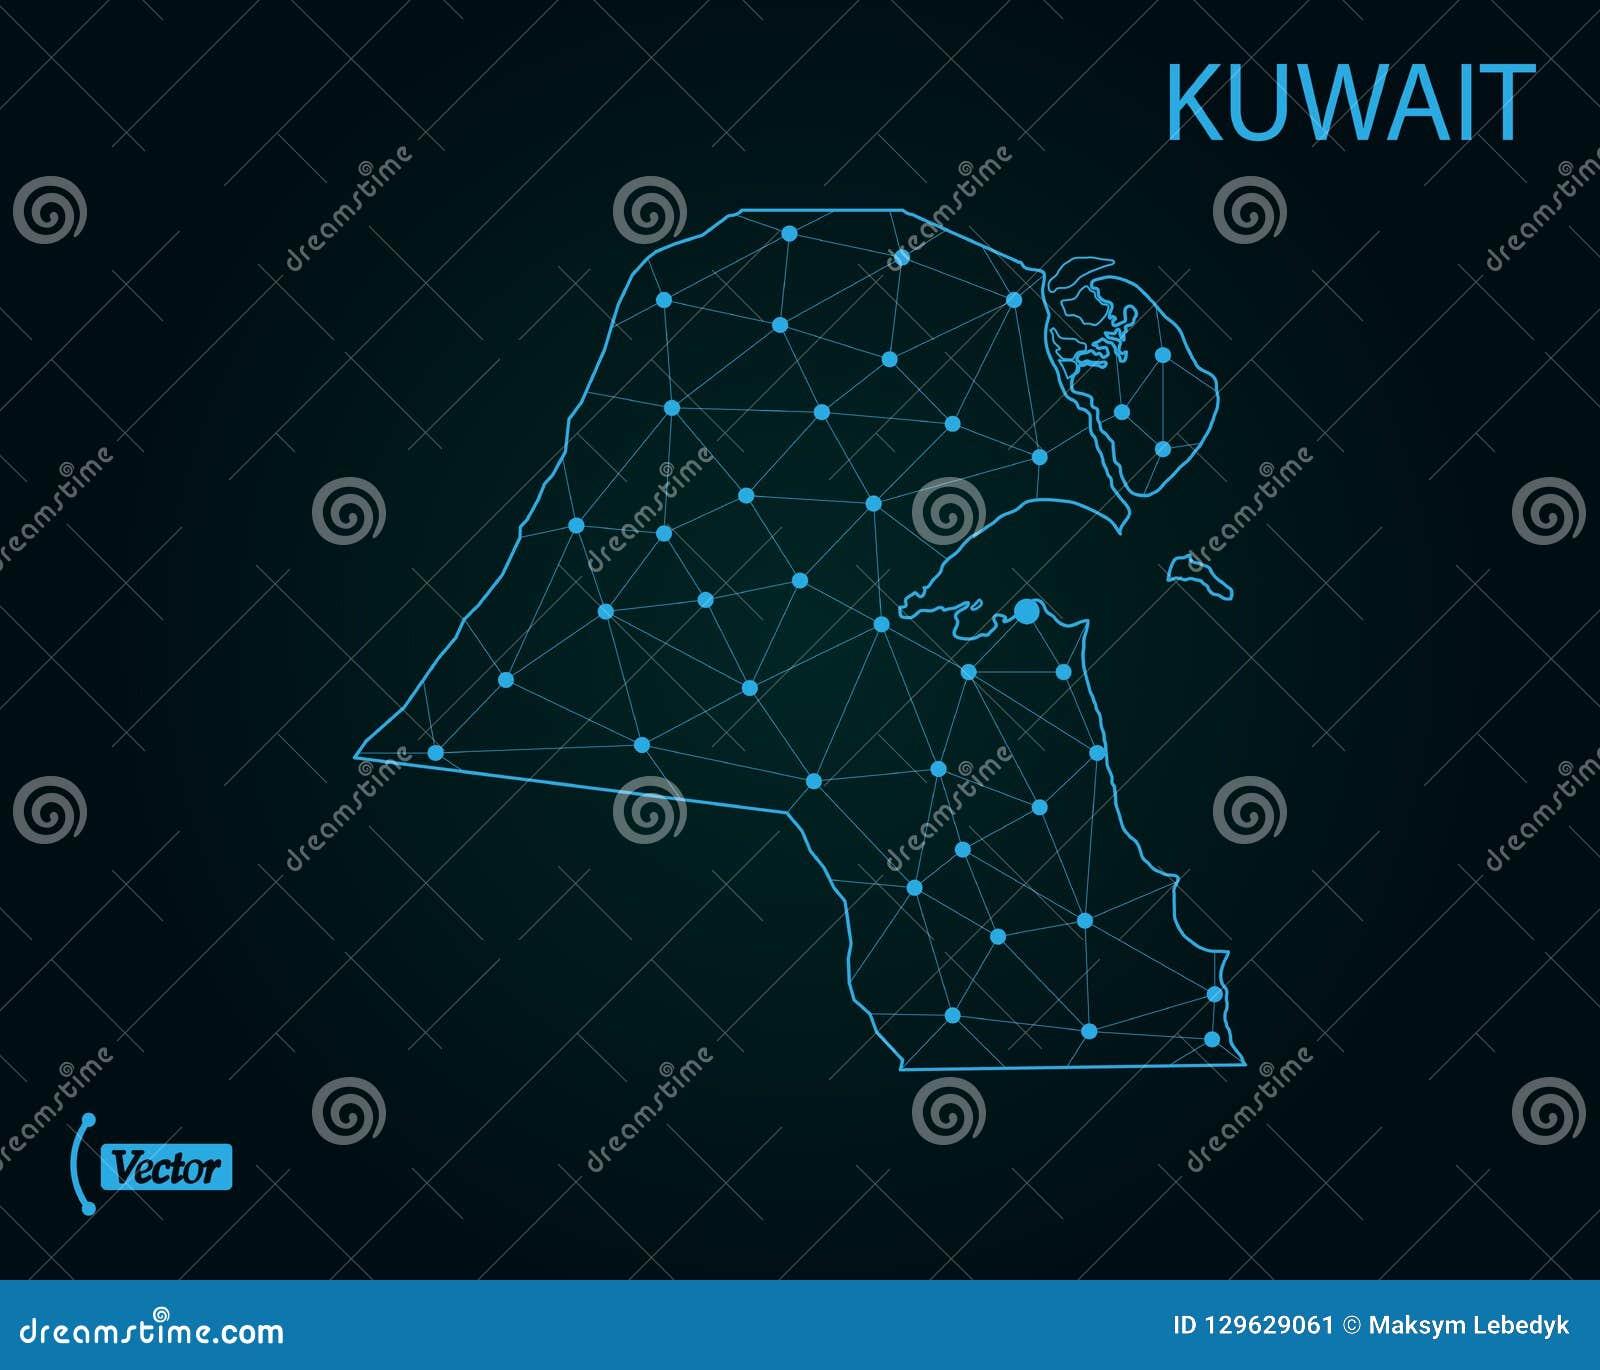 Map Of Kuwait Vector Illustration World Map Stock Illustration